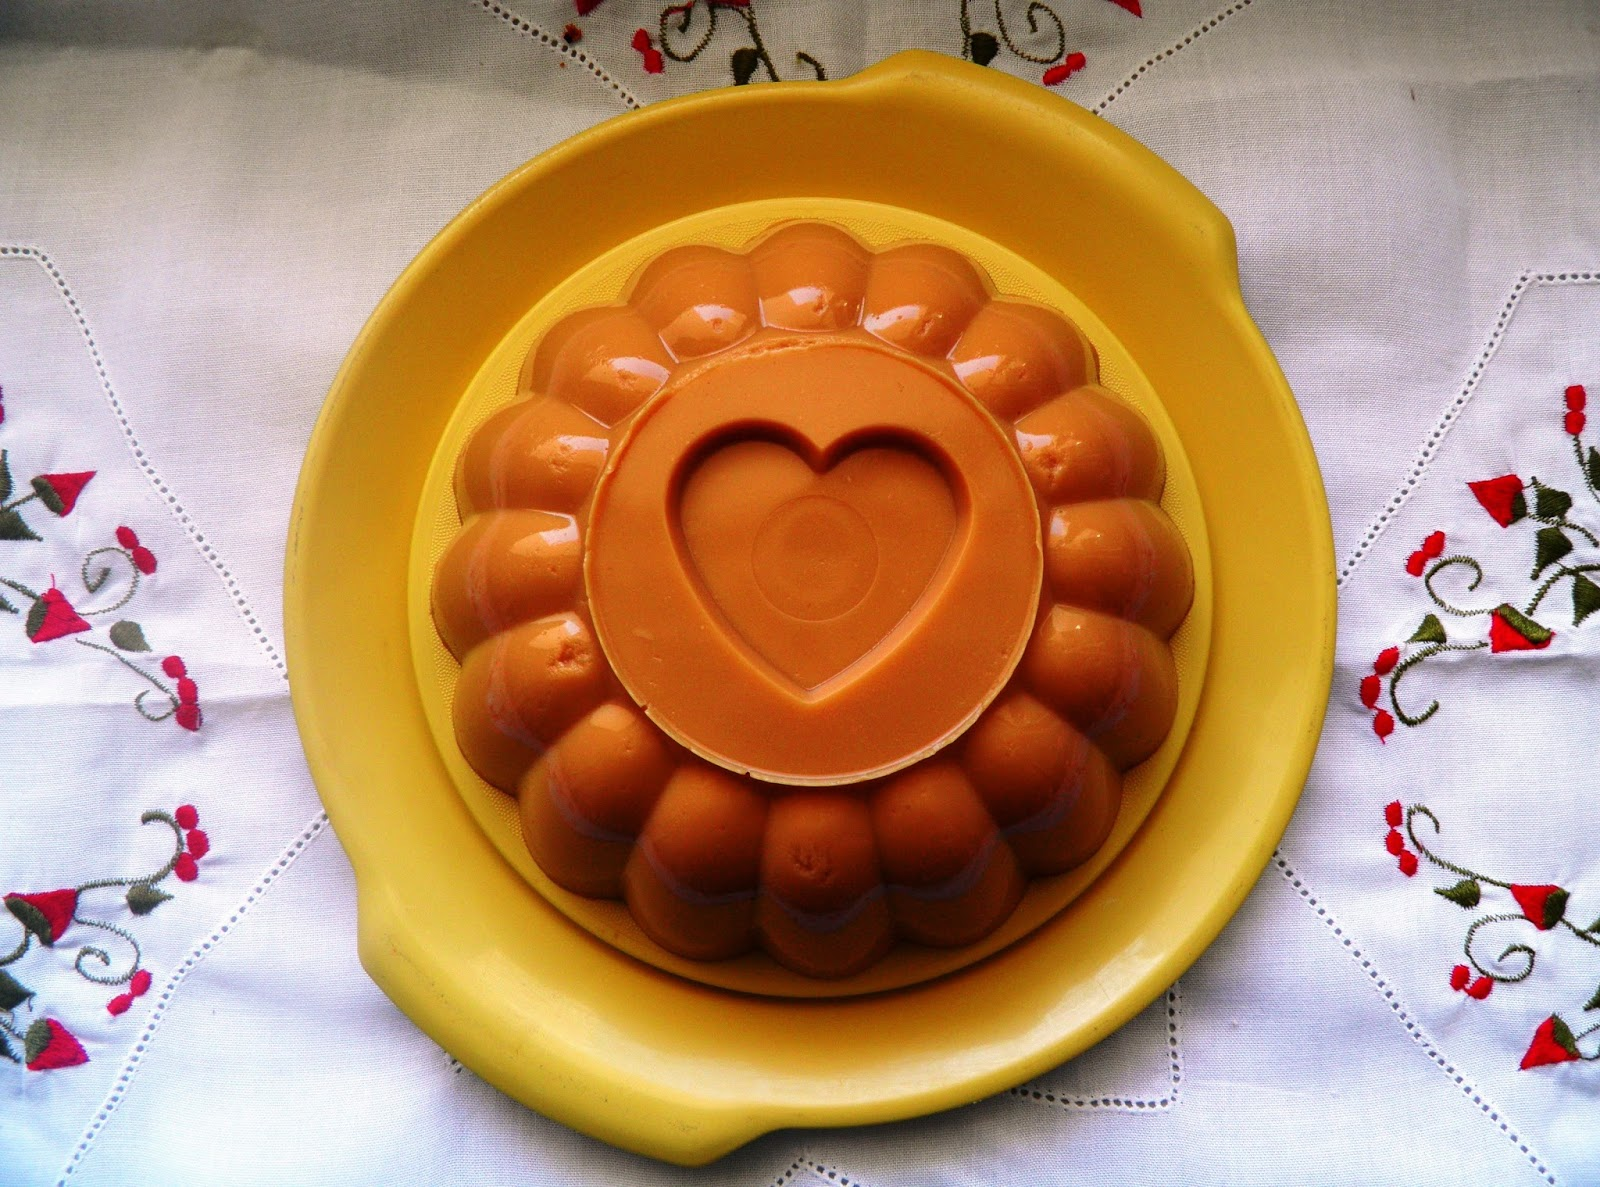 sobremesa; sobremesa sabor caramelo; PUDIM; FLAN; CARAMELO; MANJAR; GELATINA EM PÓ